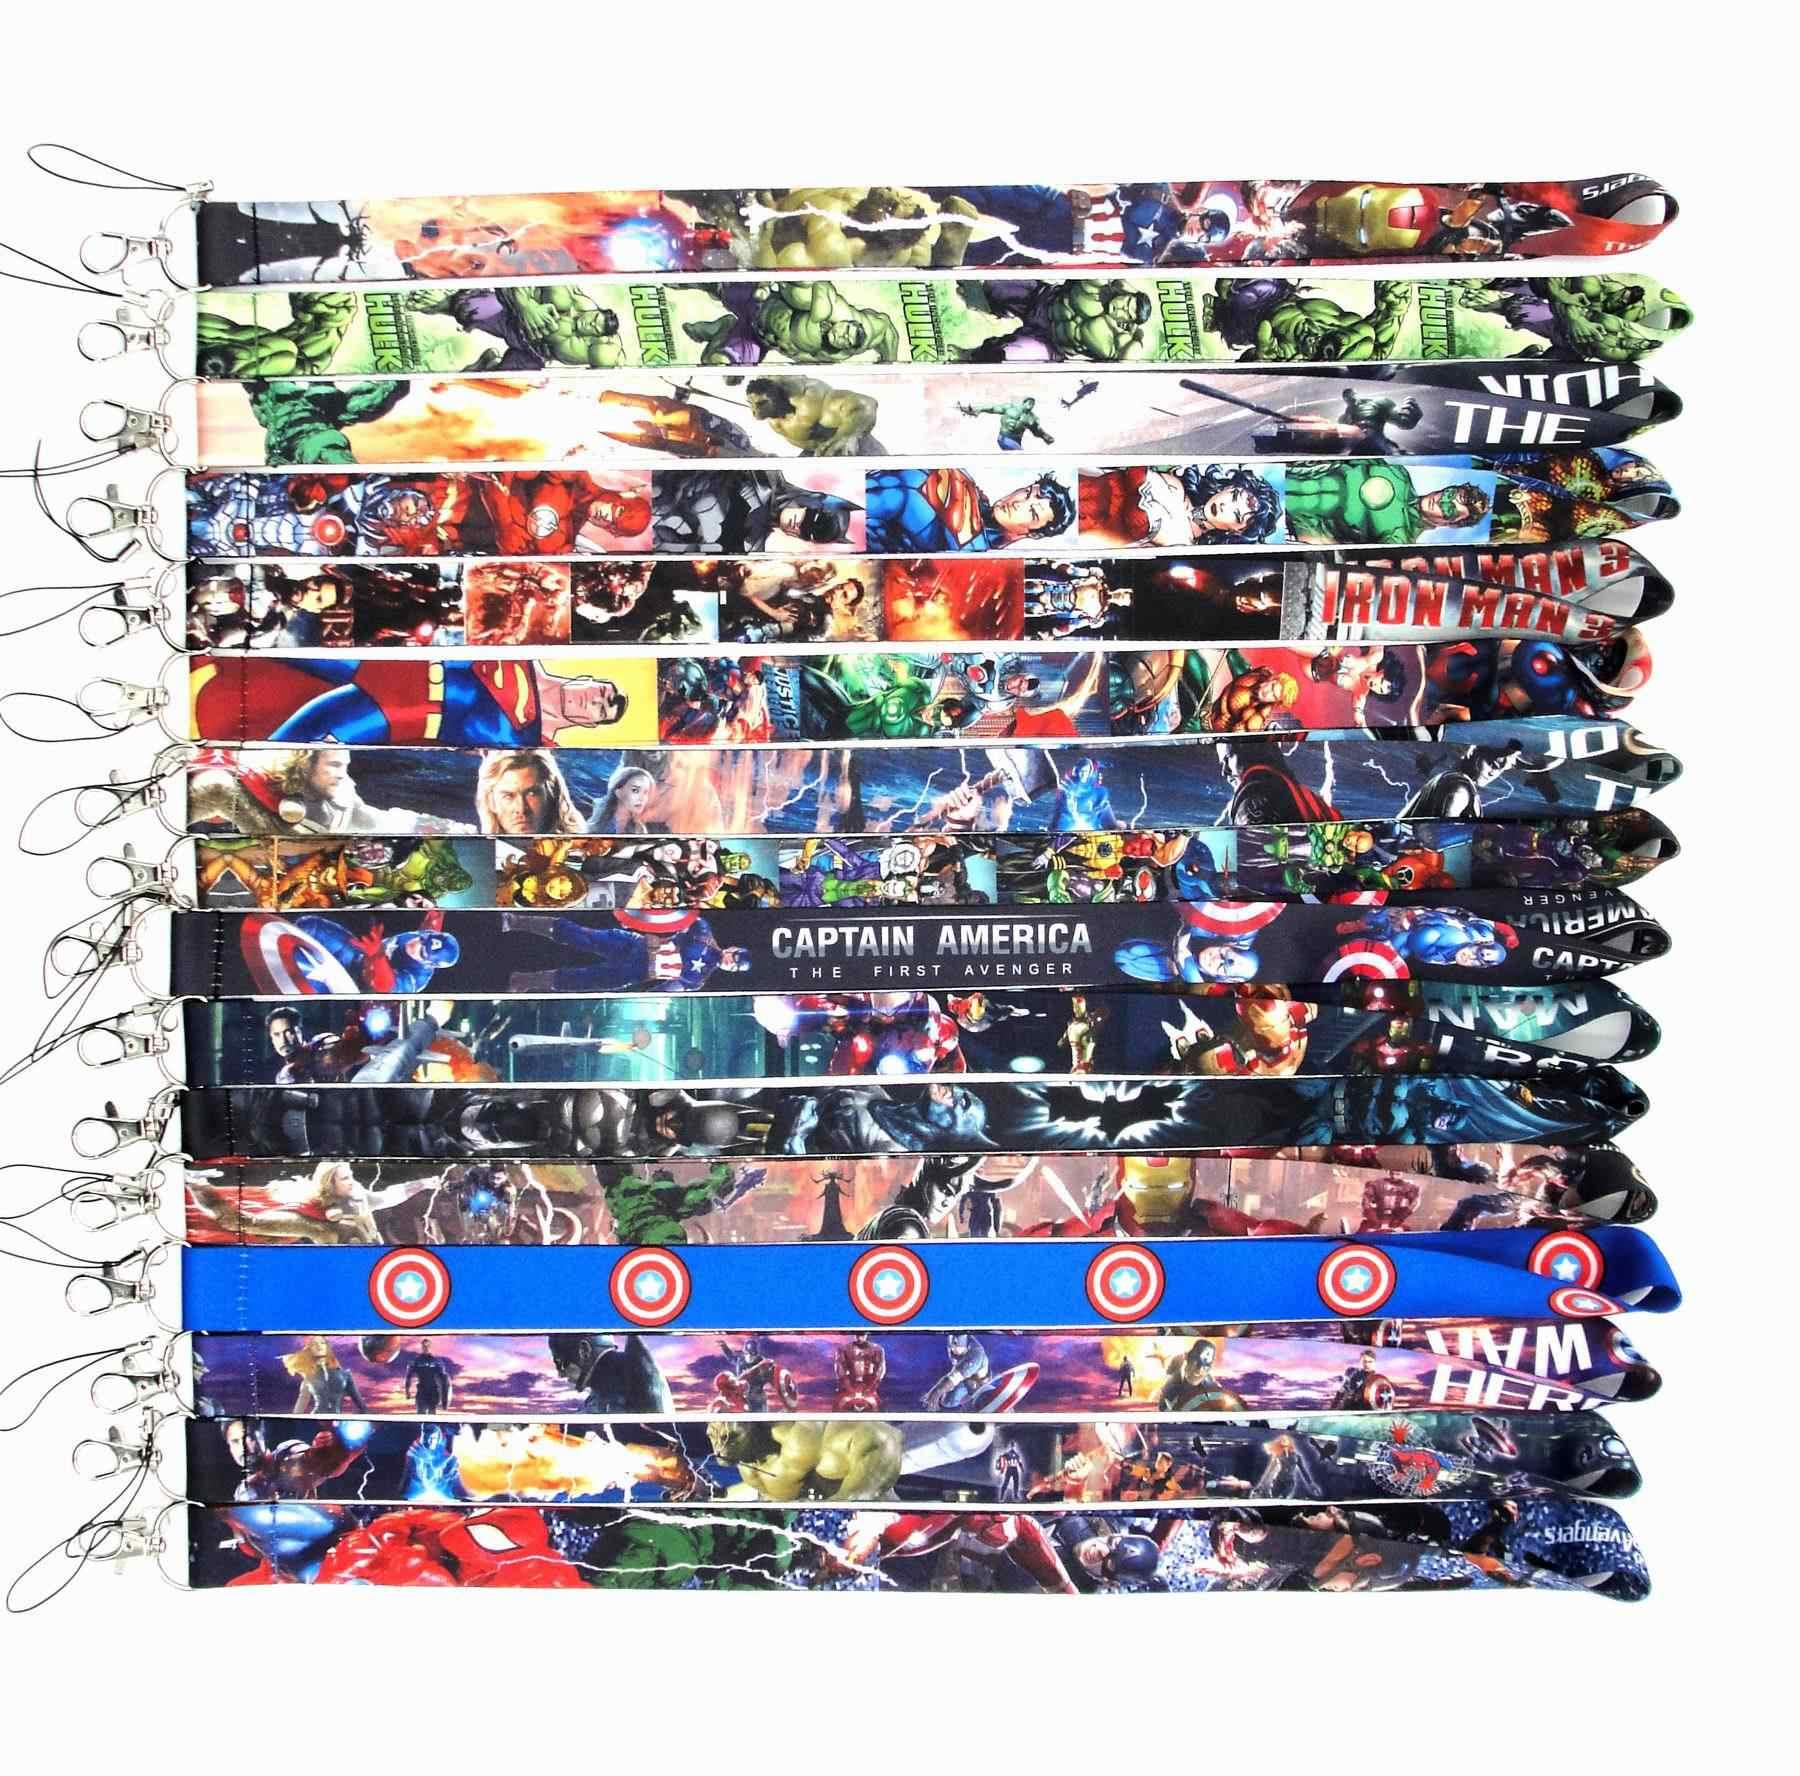 1pc Marvel Avengers Iron man อะนิเมะ Super Heros กัปตันอเมริกา Spiderman hulk Batman Lanyard Gym คอของเล่น